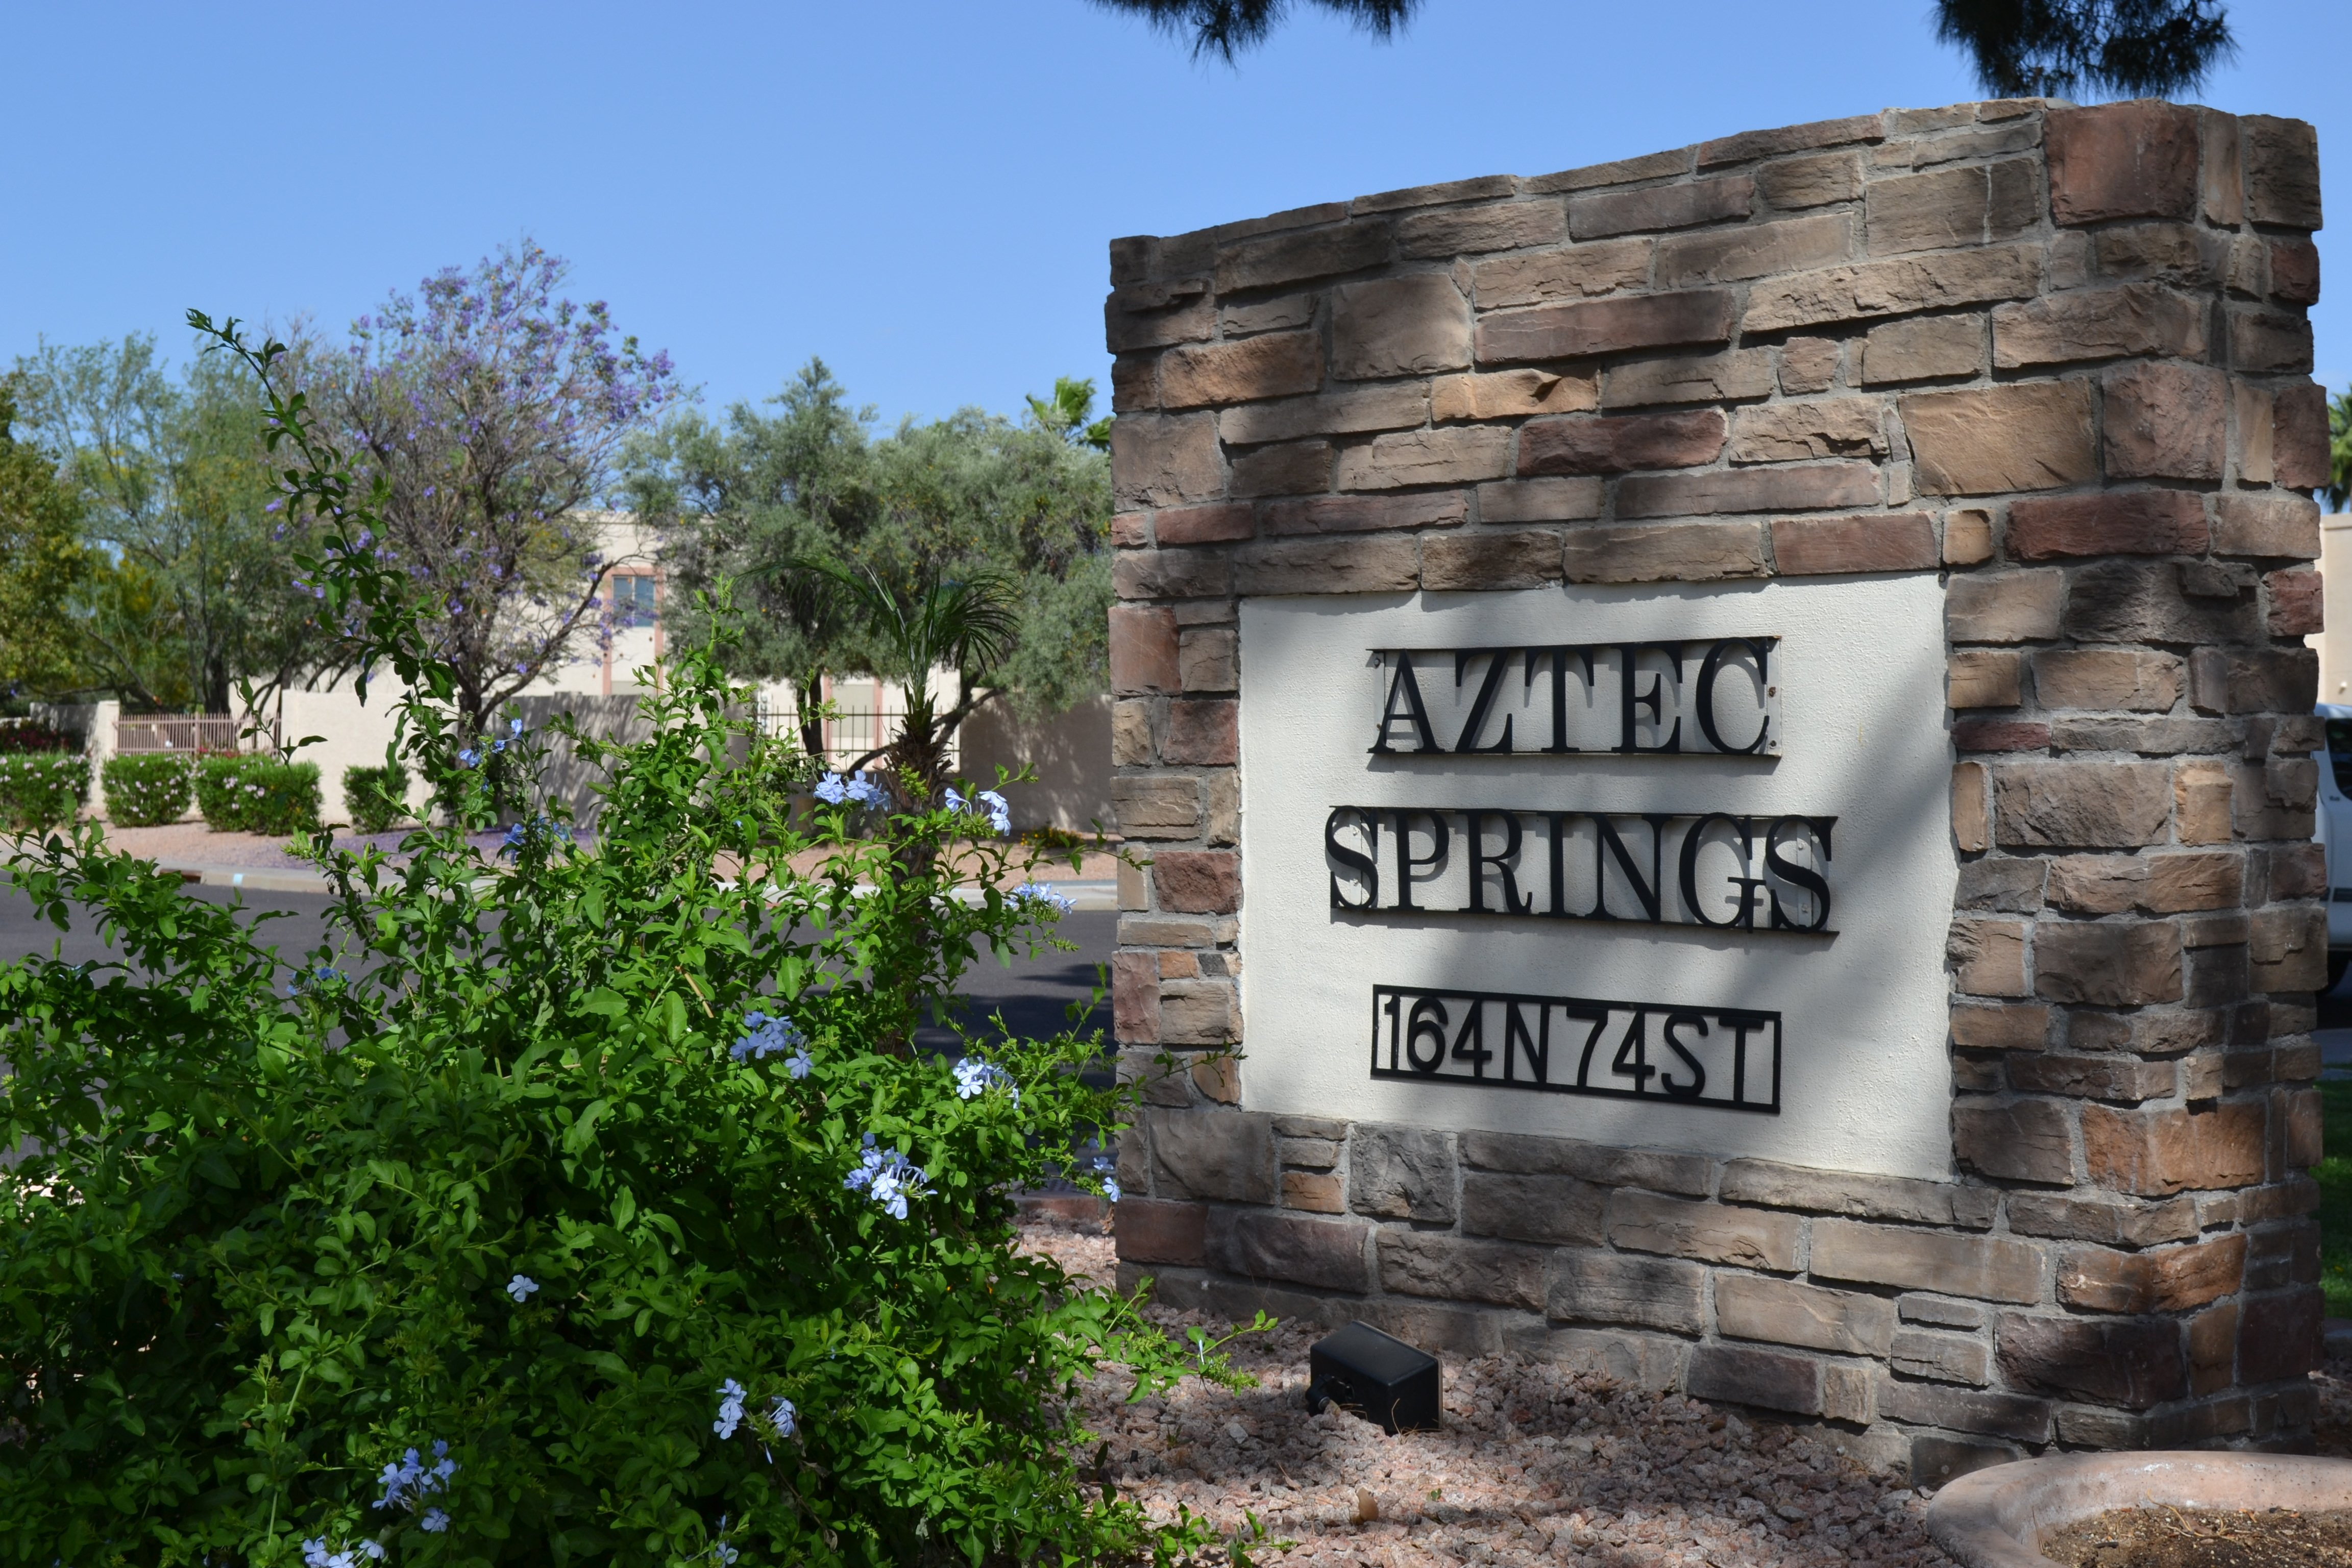 Aztec Springs Apartments image 0